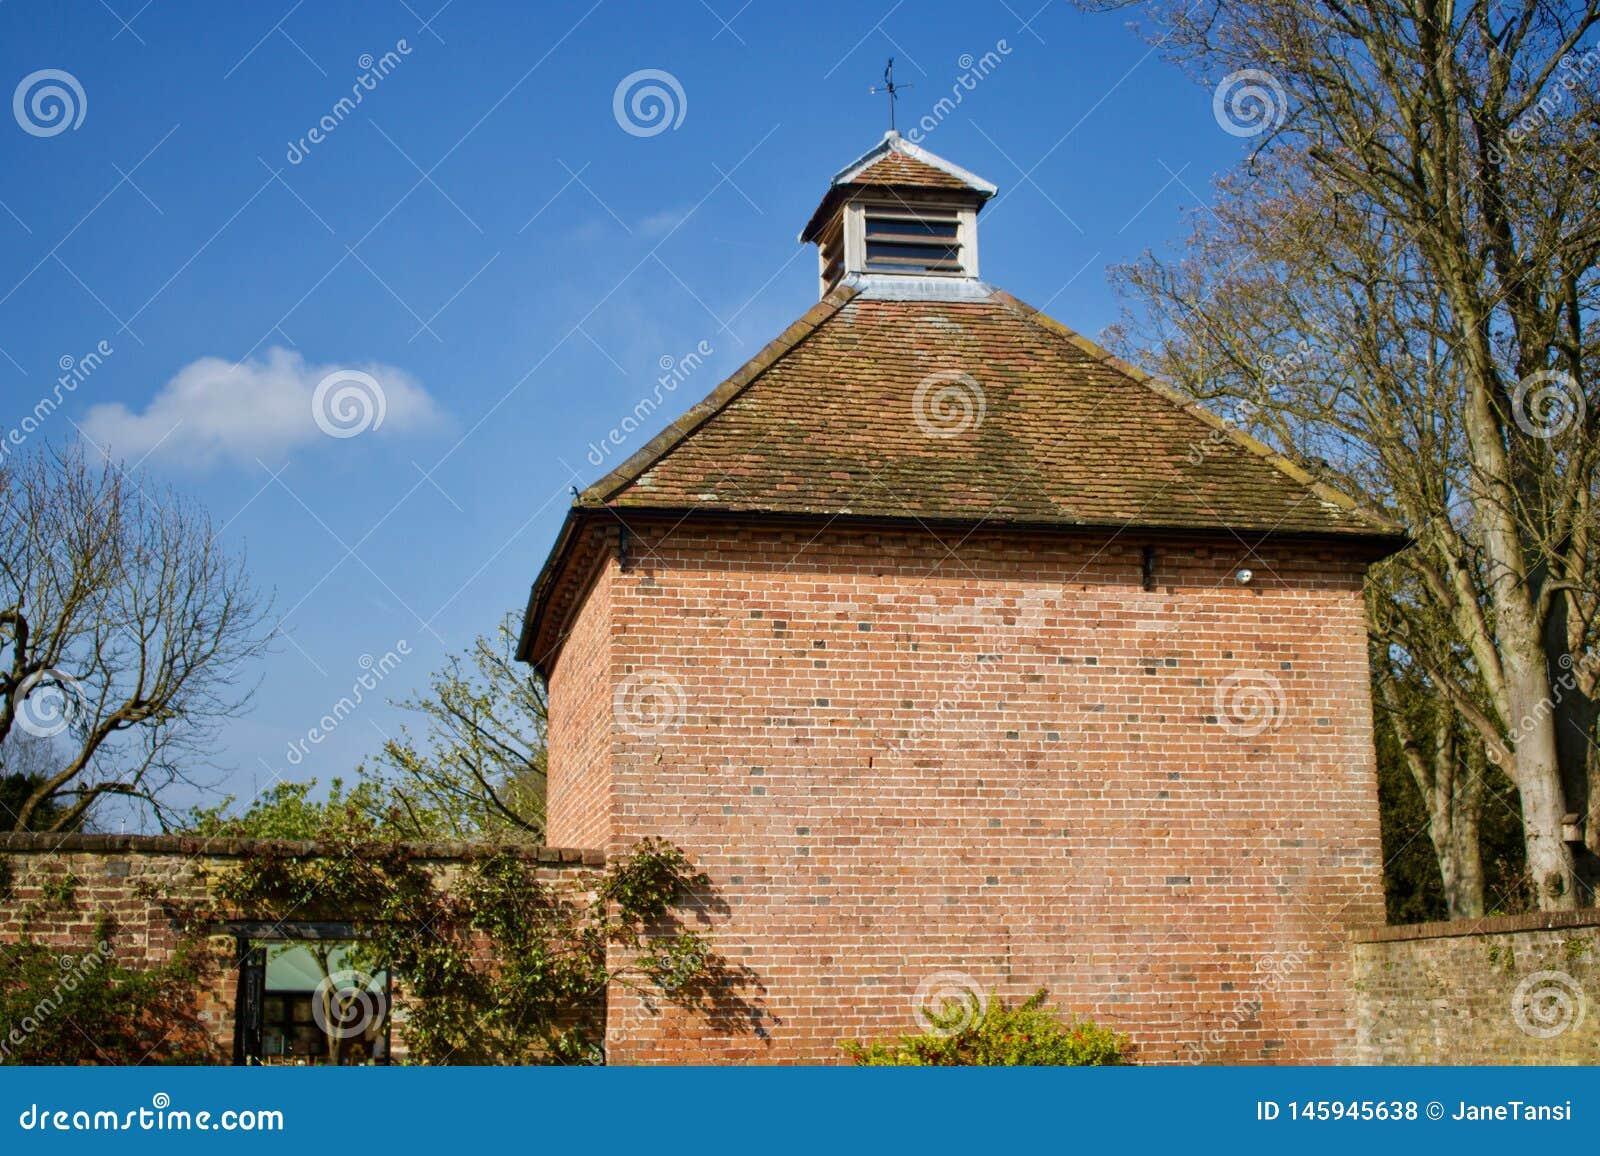 Byggd gammal tegelsten dök skjulet med det belade med tegel taket för terrakottan mot blå himmel - bild